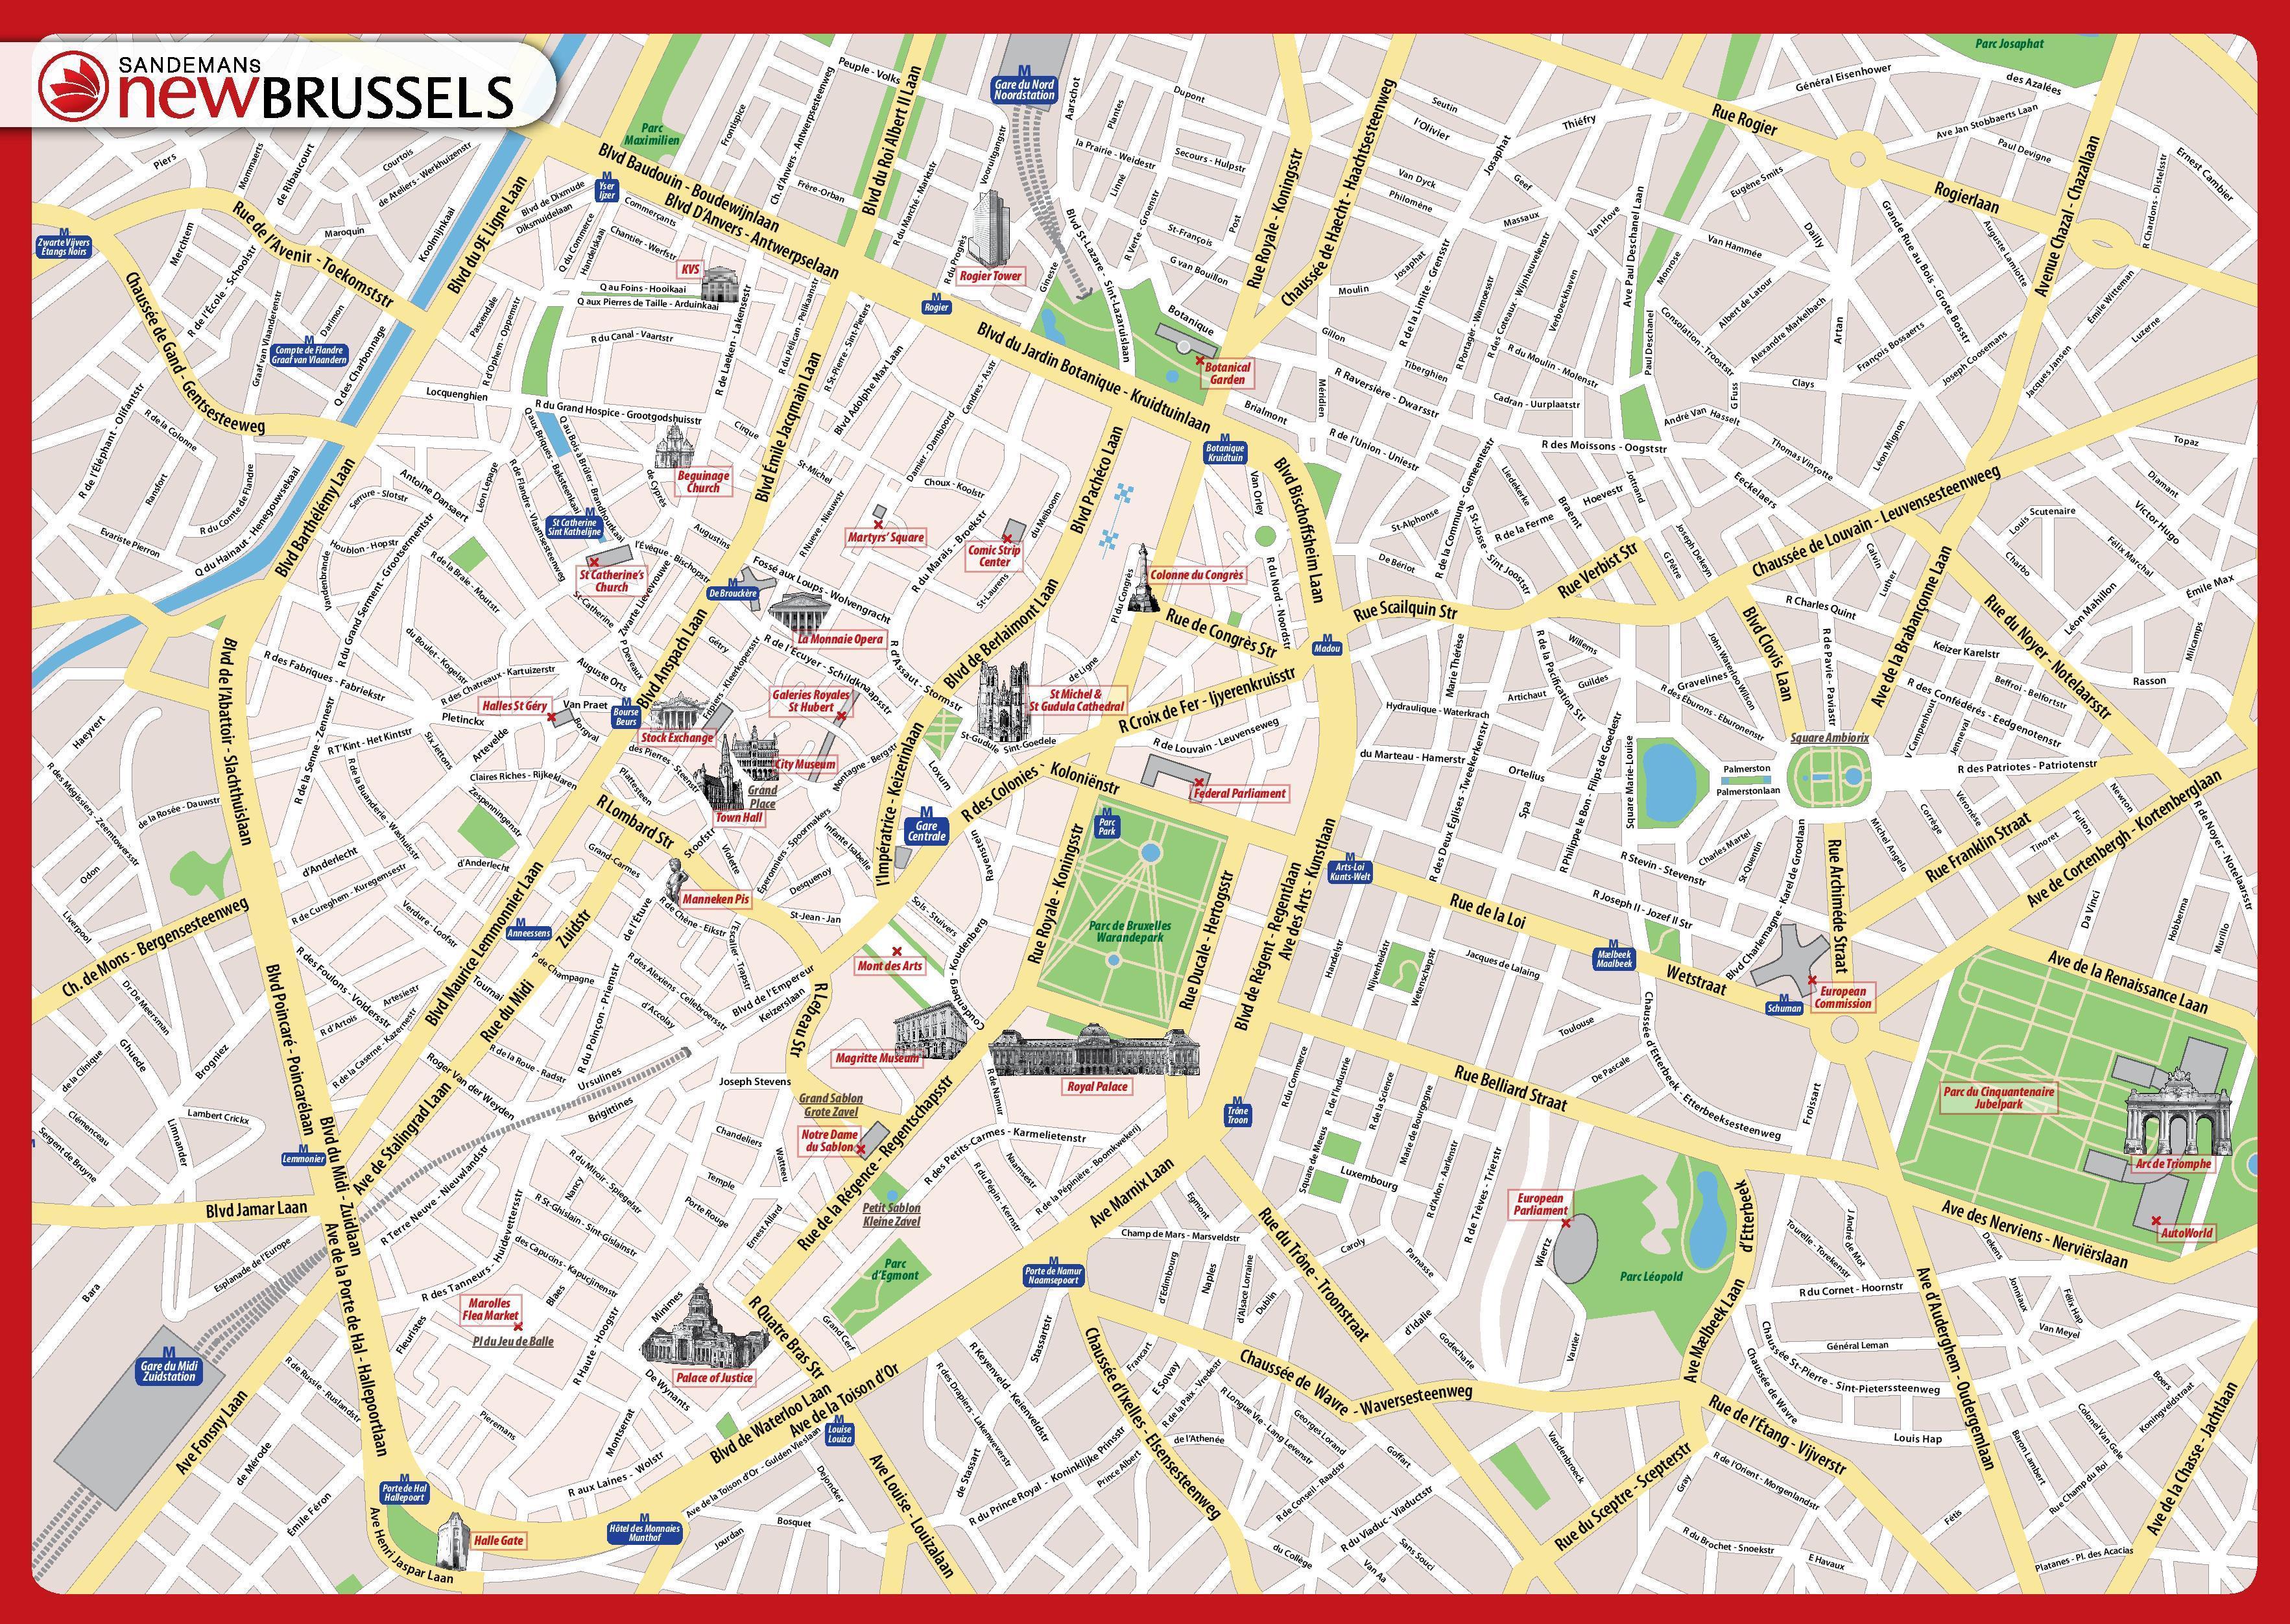 Mapa Turistico Budapest Pdf.Bruselas Mapa Turistico Pdf Mapa De Bruselas Mapa